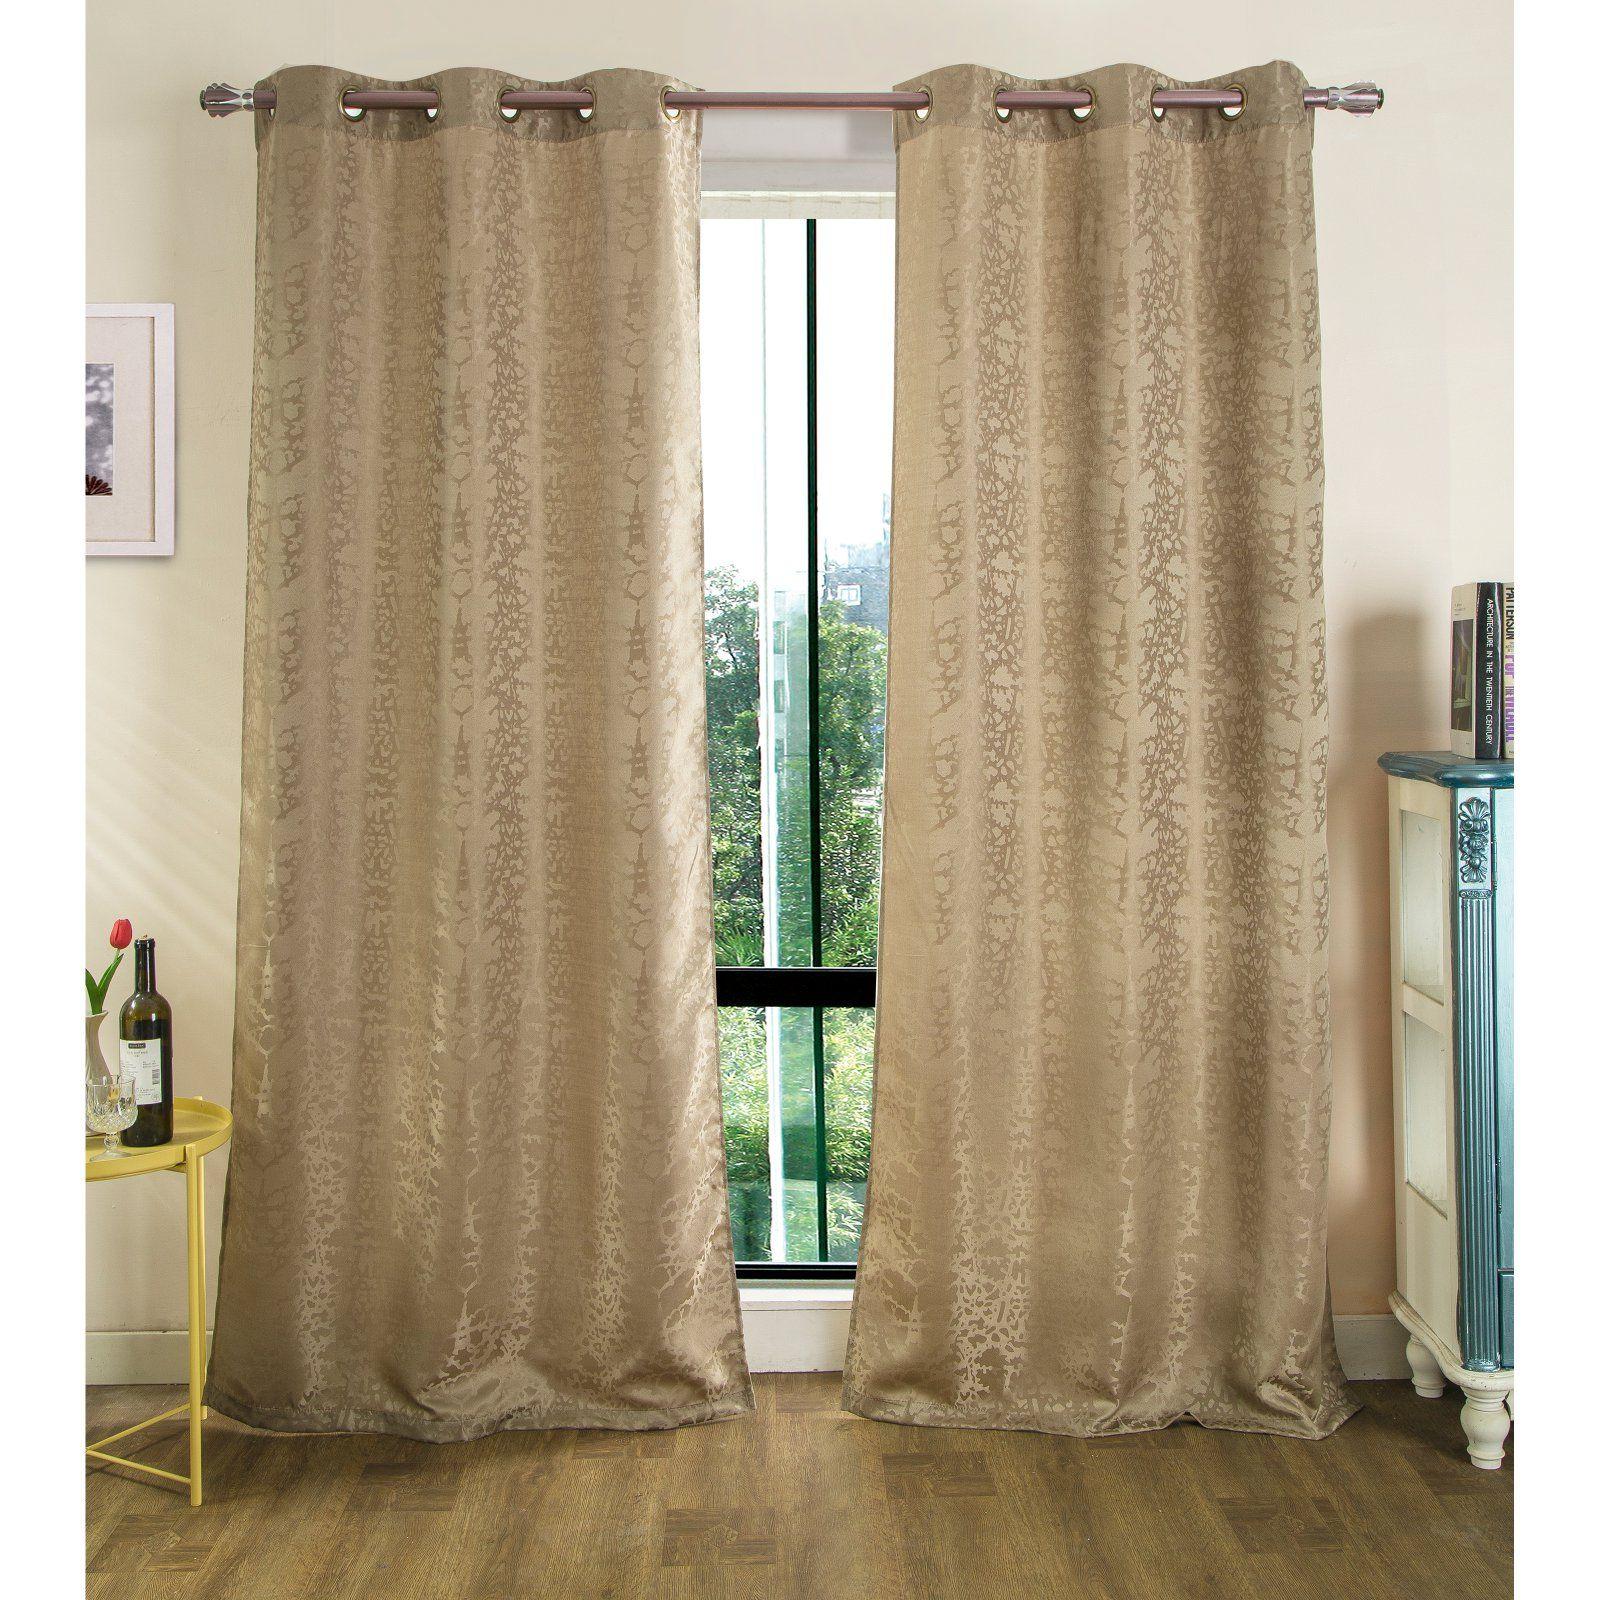 Rt Designers Collection Tina Jacquard Grommet Curtain Panel Pair